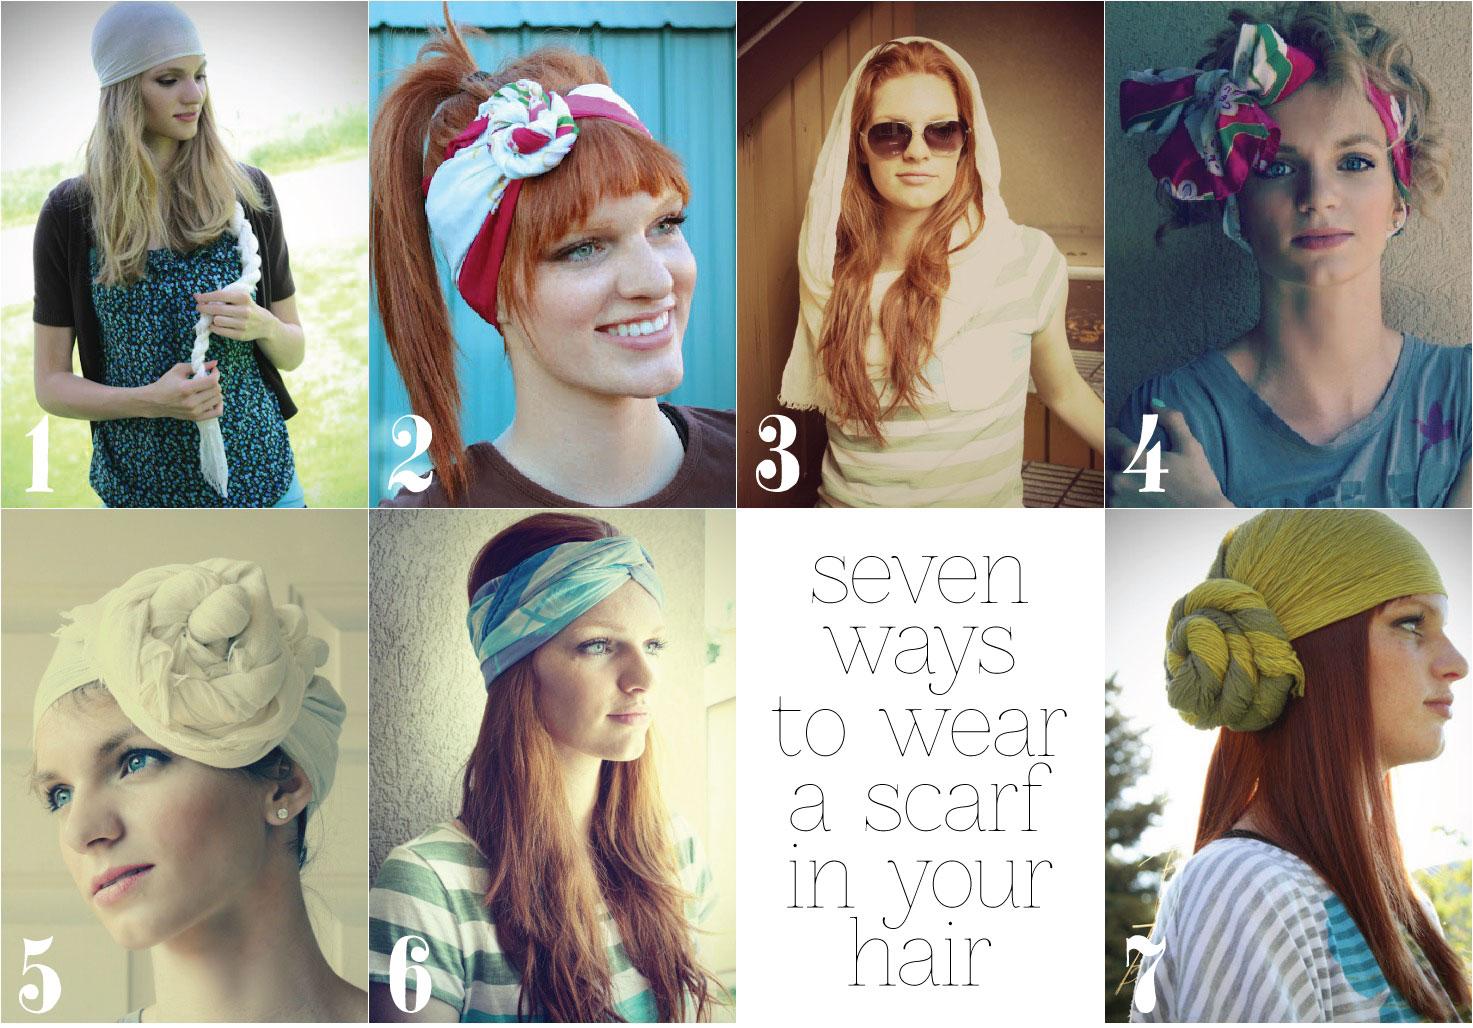 http://3.bp.blogspot.com/-58HbG9WTJDc/T9lVbXw6qWI/AAAAAAAAGDs/LG8OcD_9Q9w/s1600/7-ways-to-wear-a-scarf-in-y.jpg